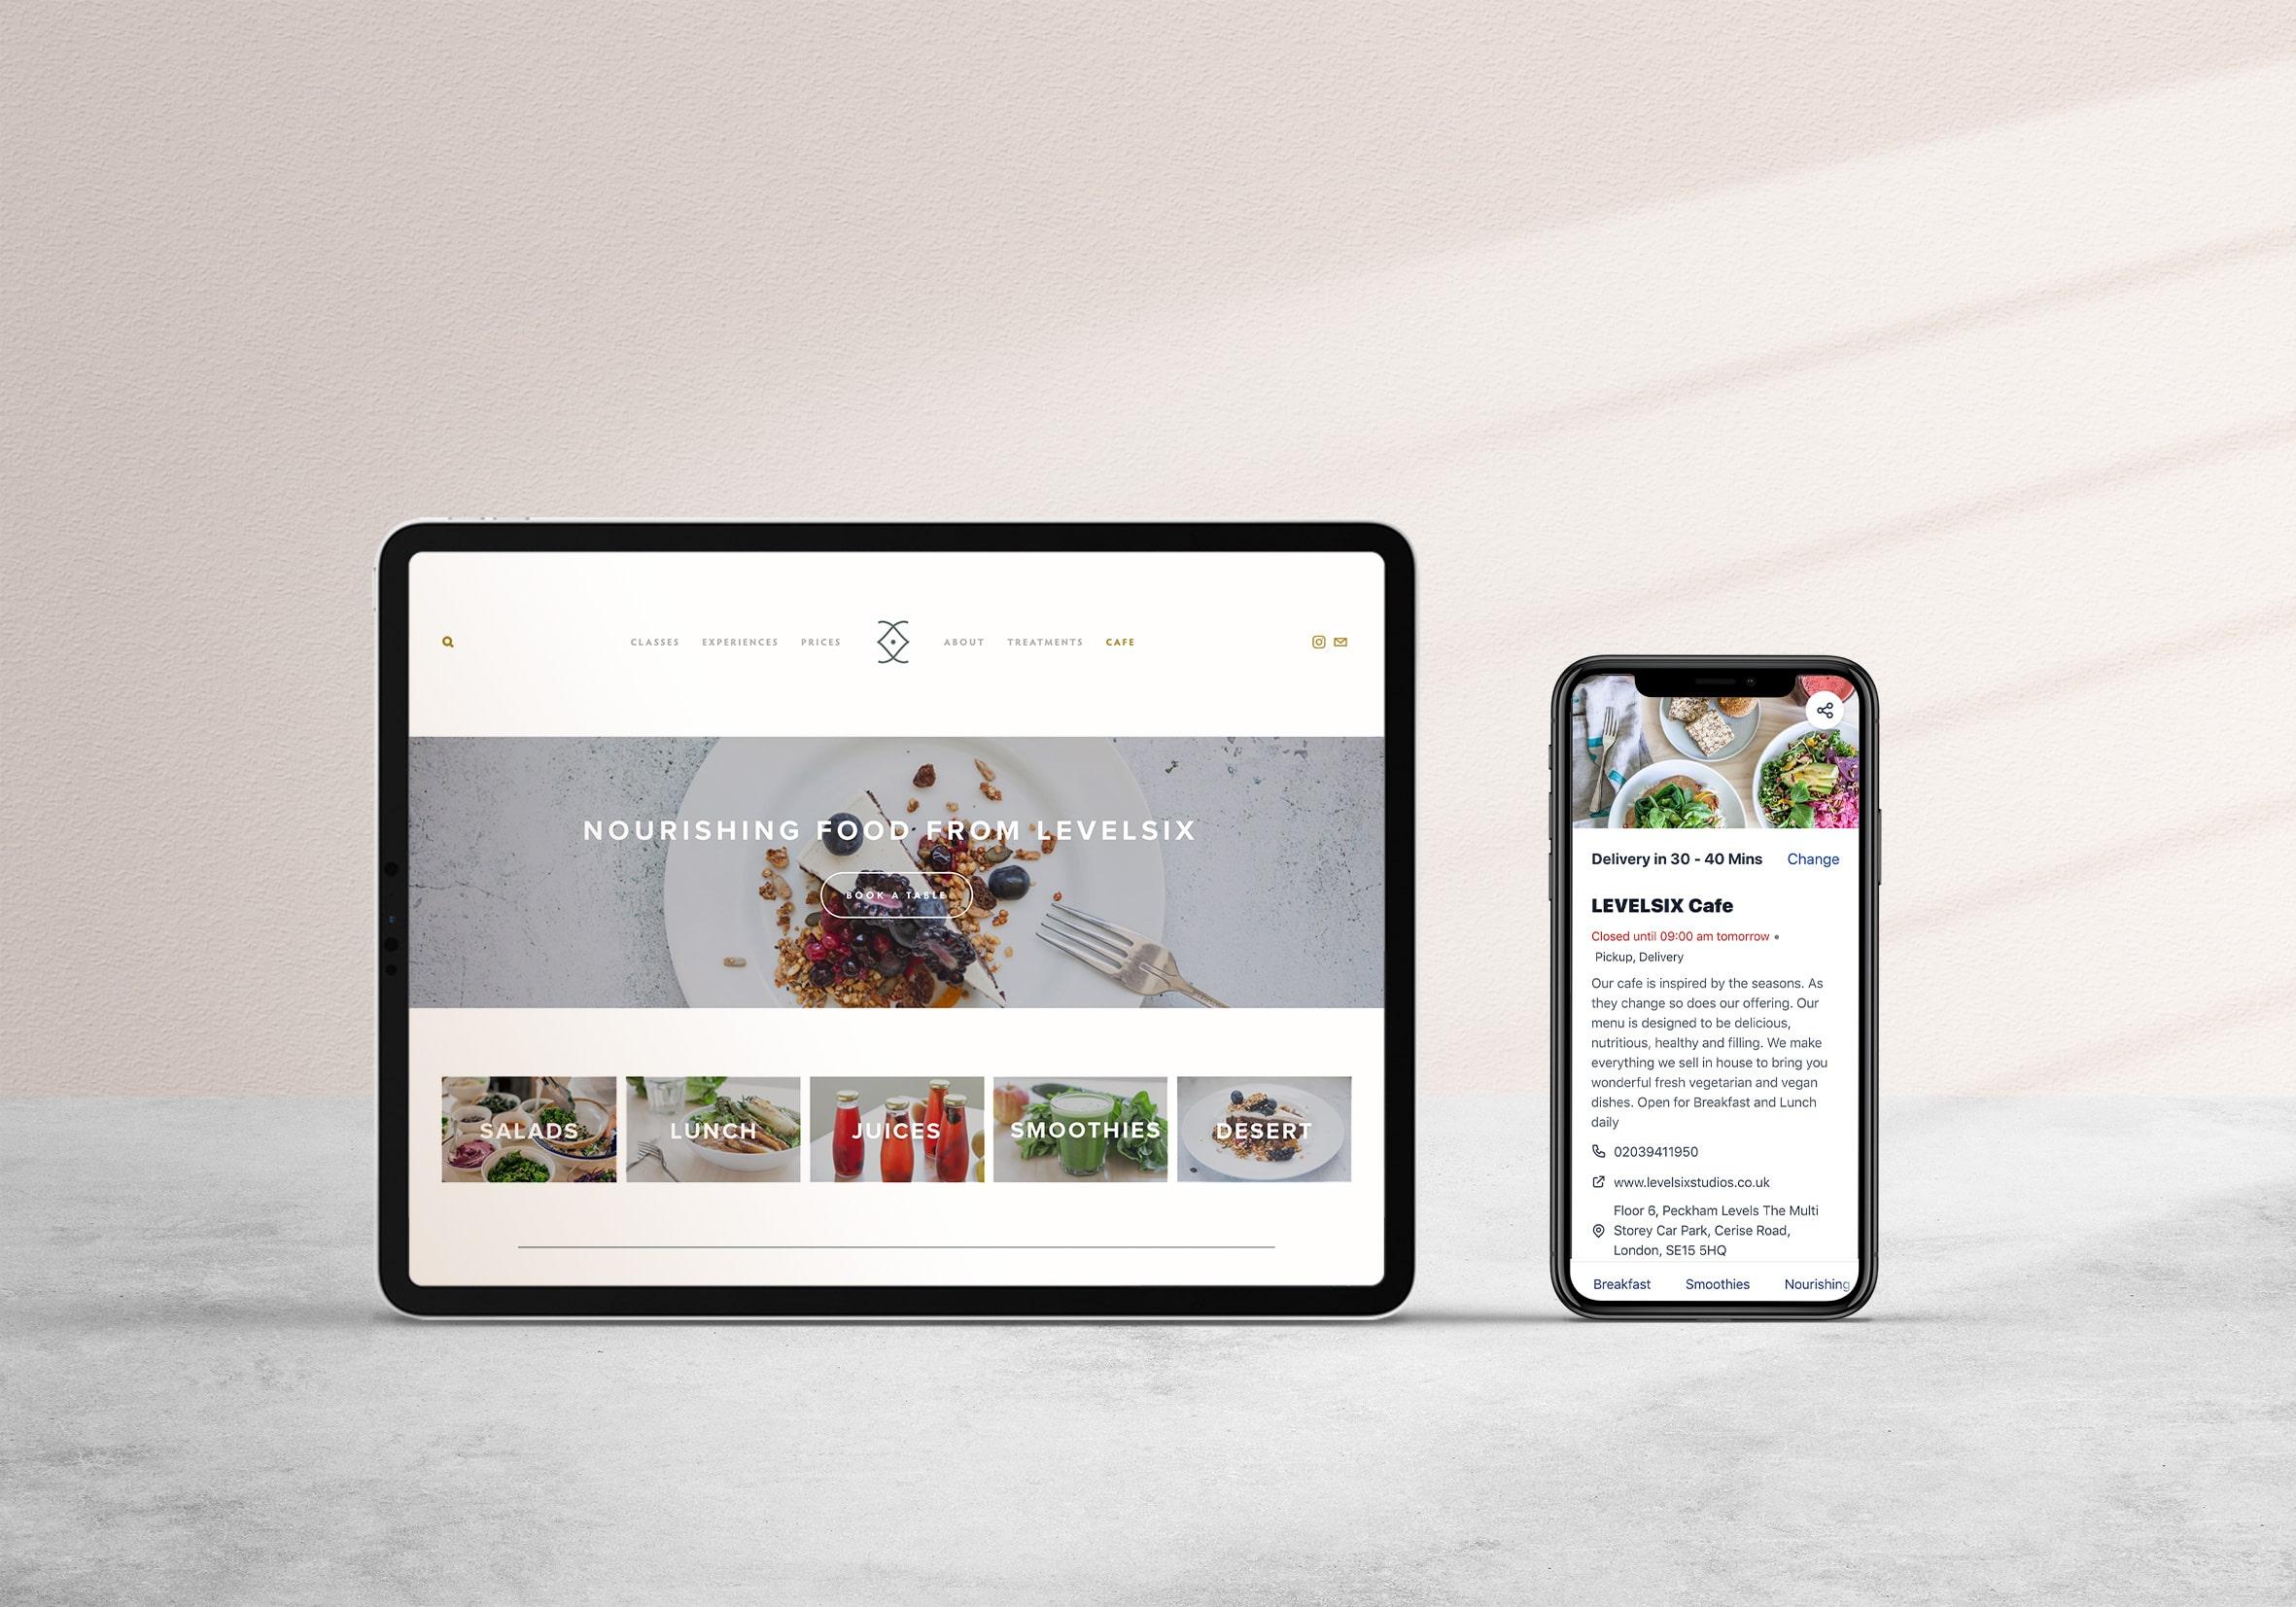 Level Six Cafe website